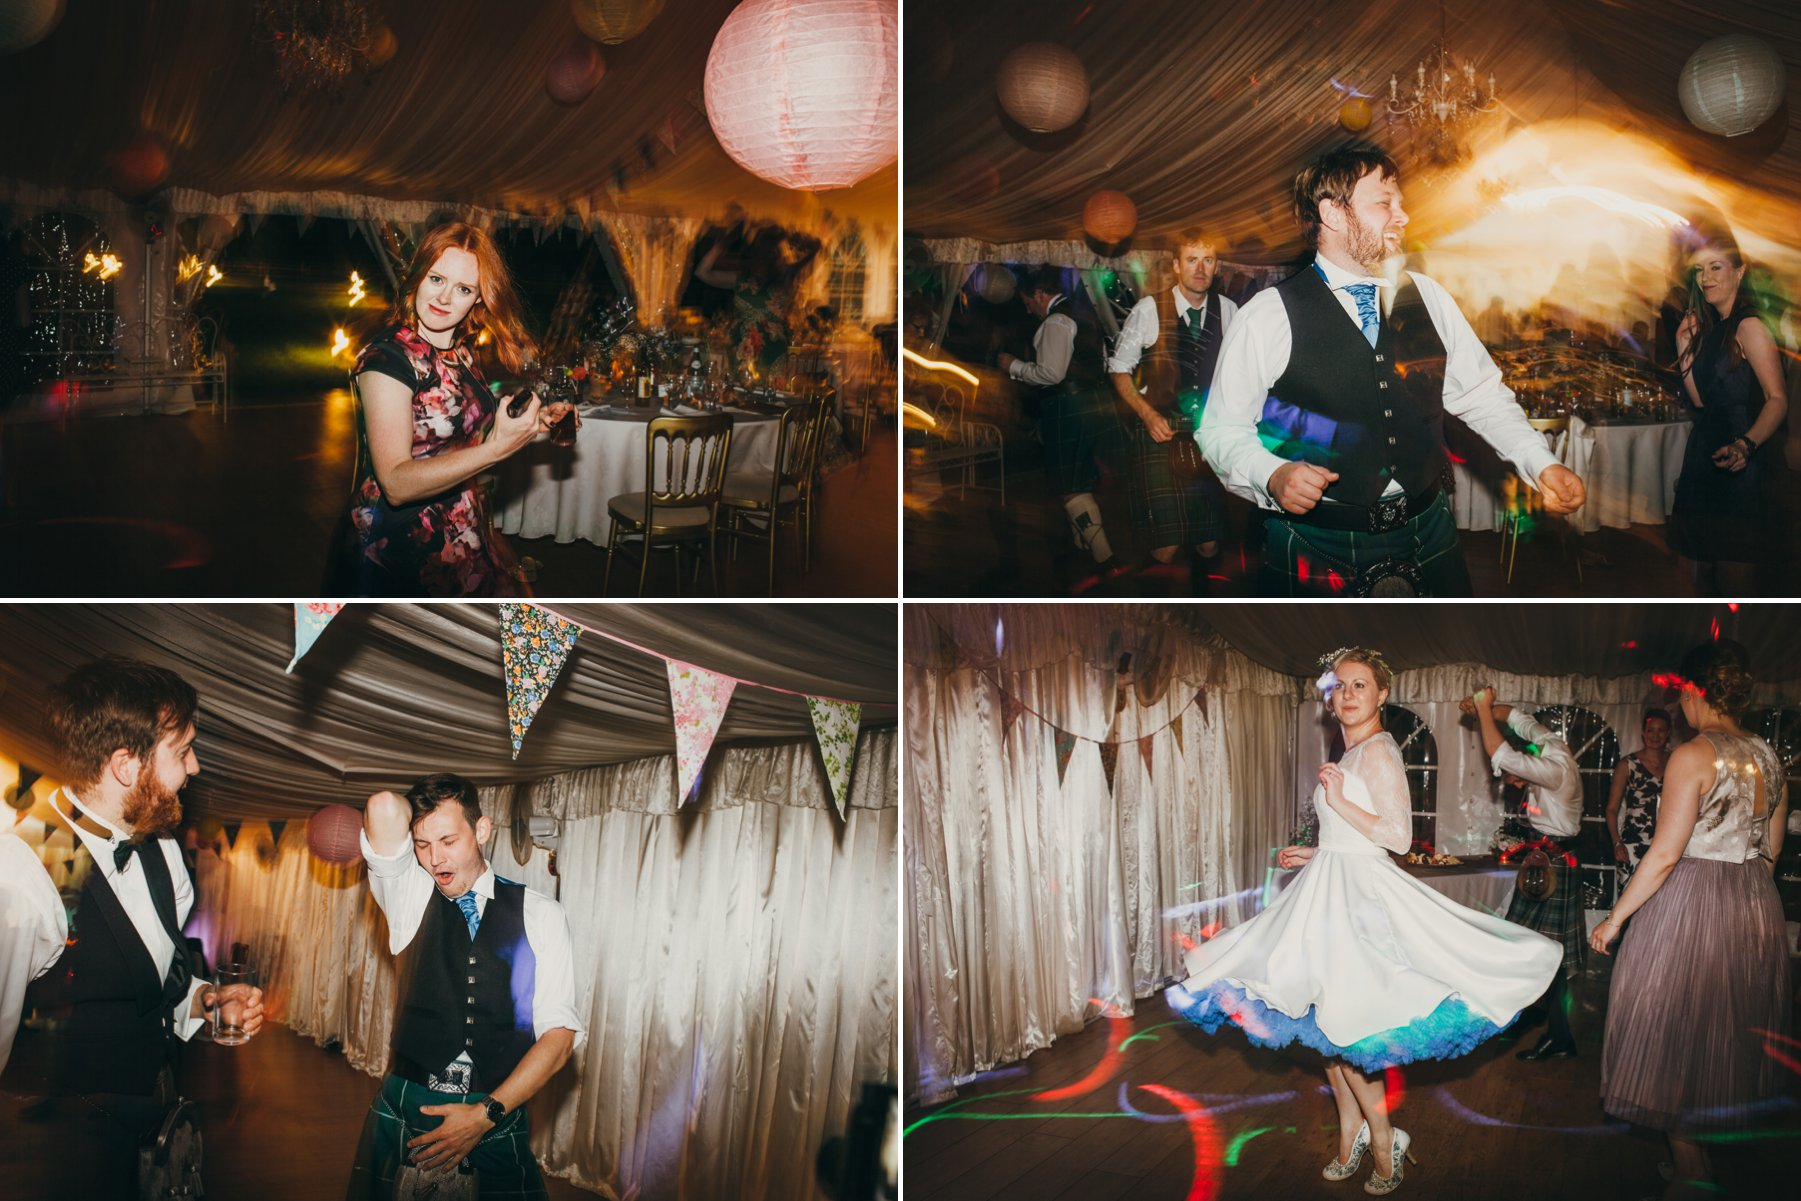 petitmoulin_france_bordeaux_weddings_0134